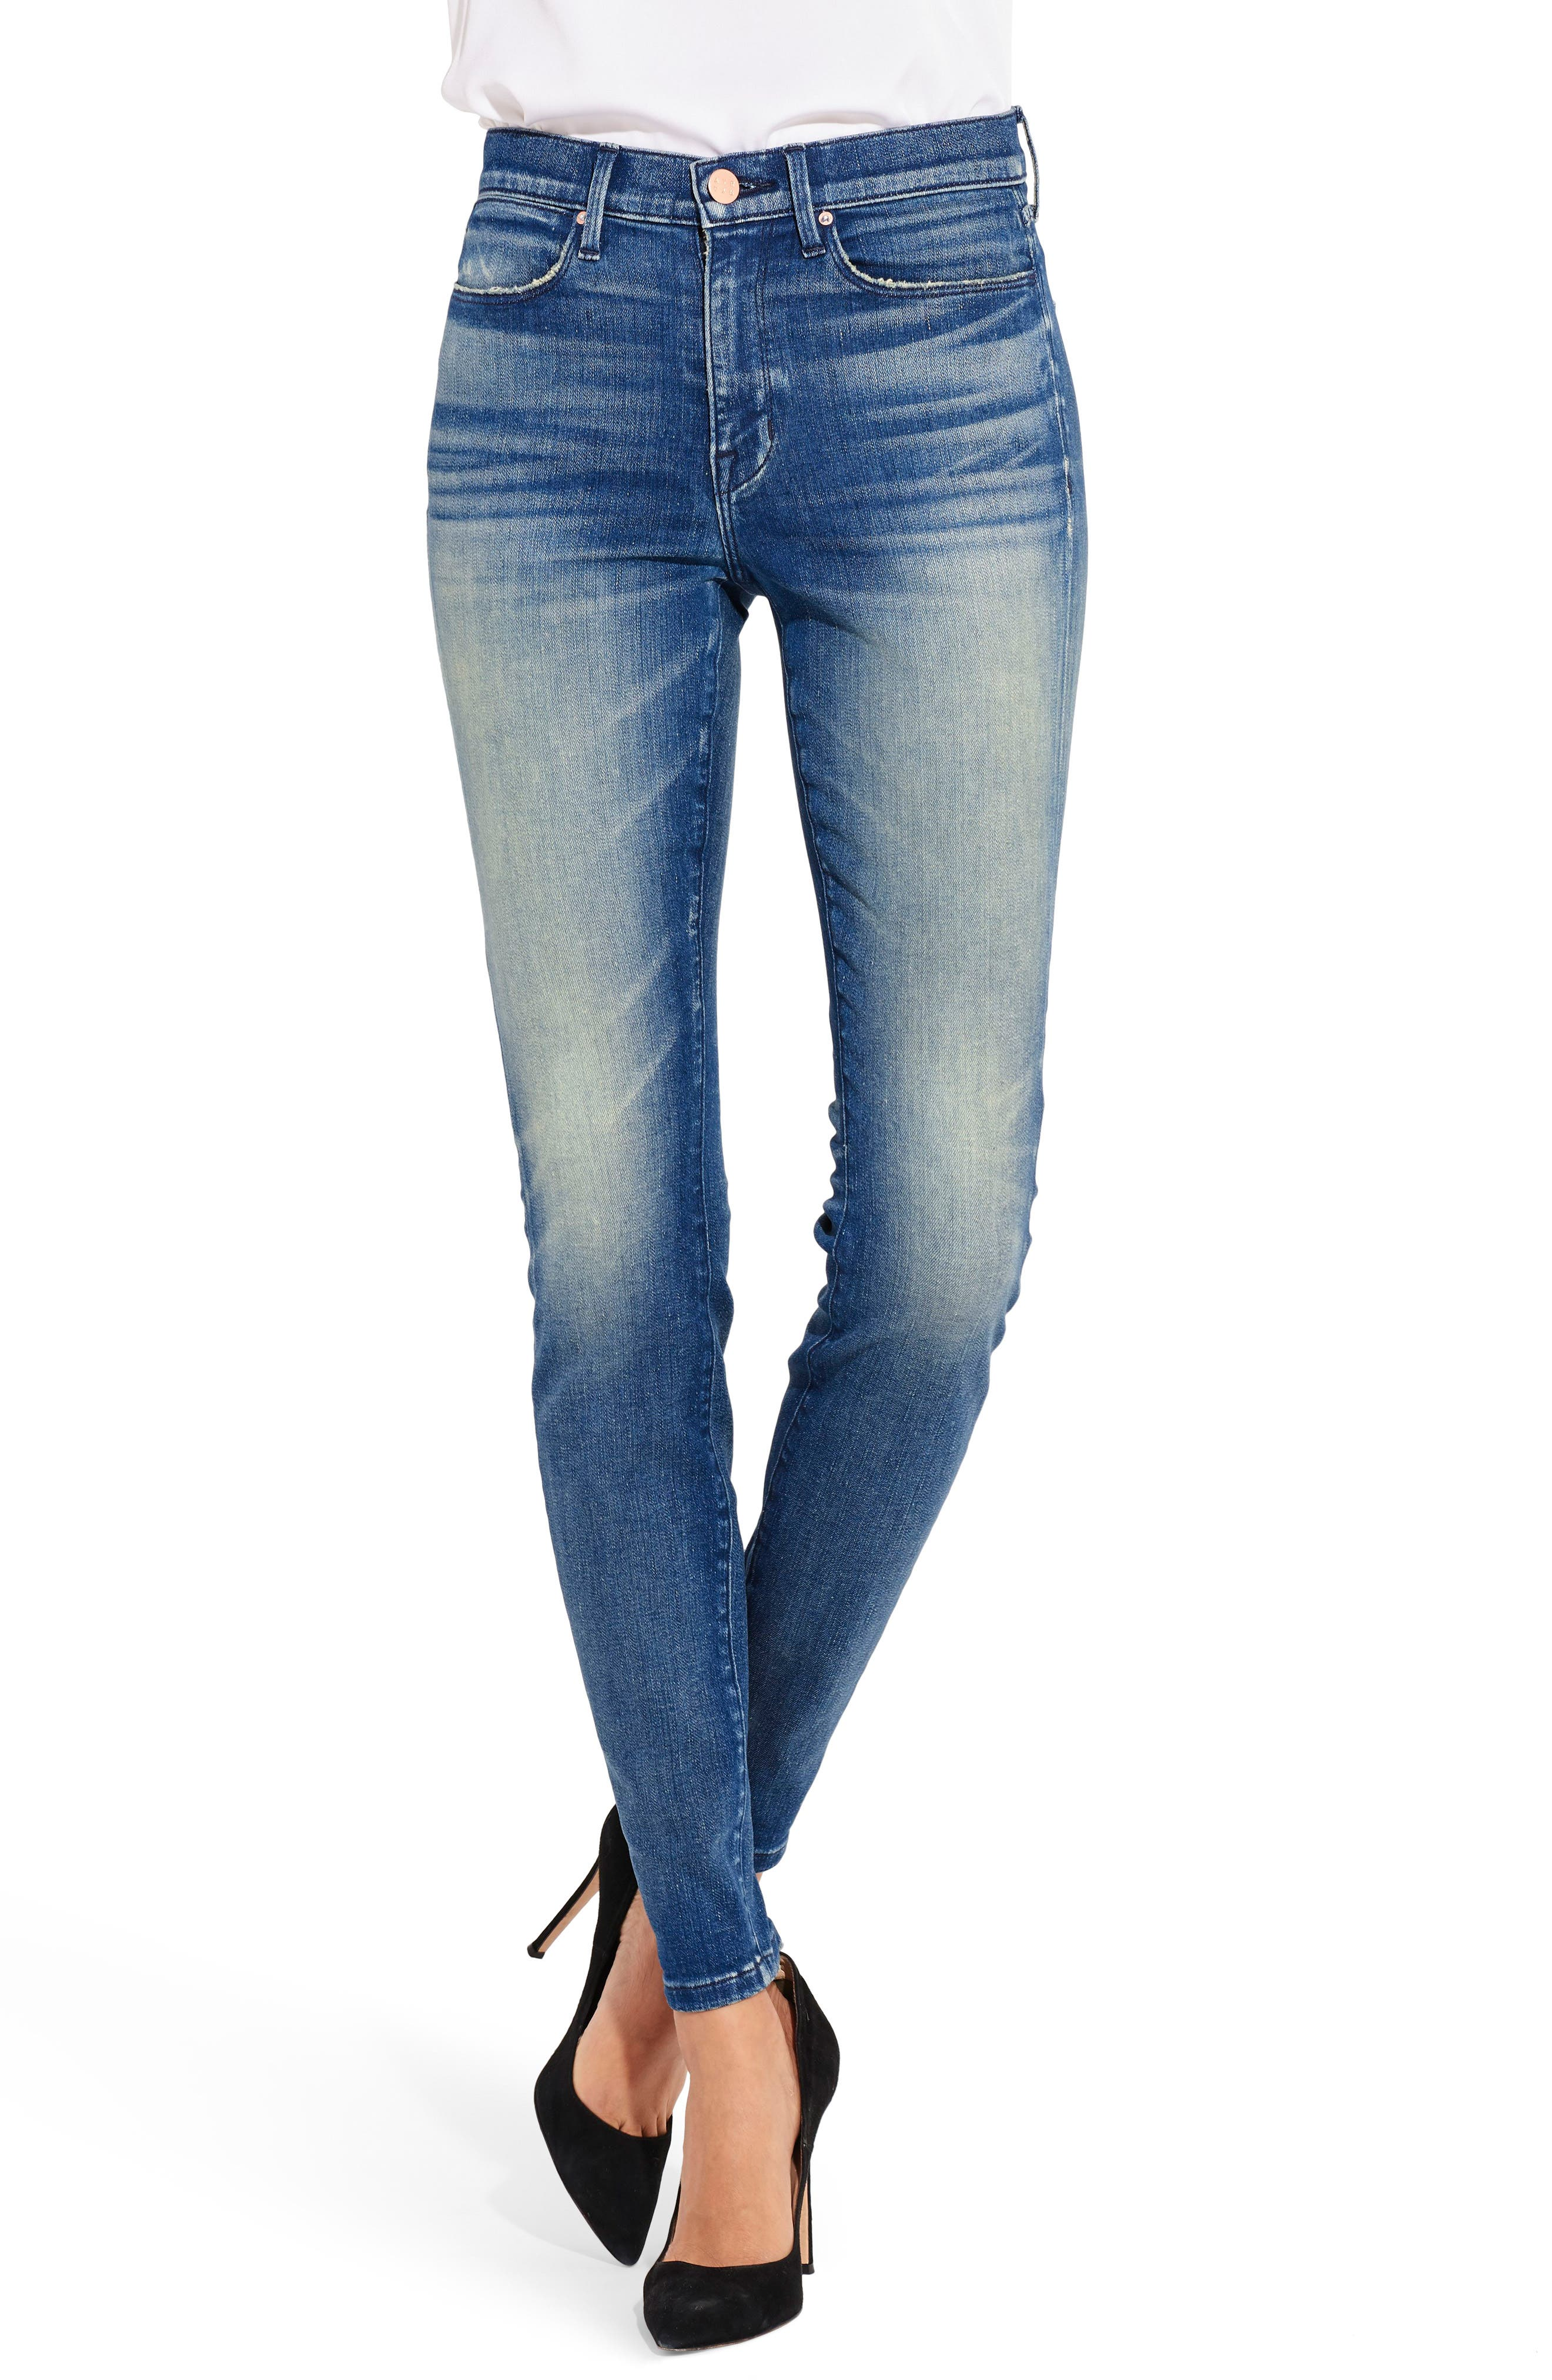 Main Image - AYR The Skinny Jeans (Papas Fritas)